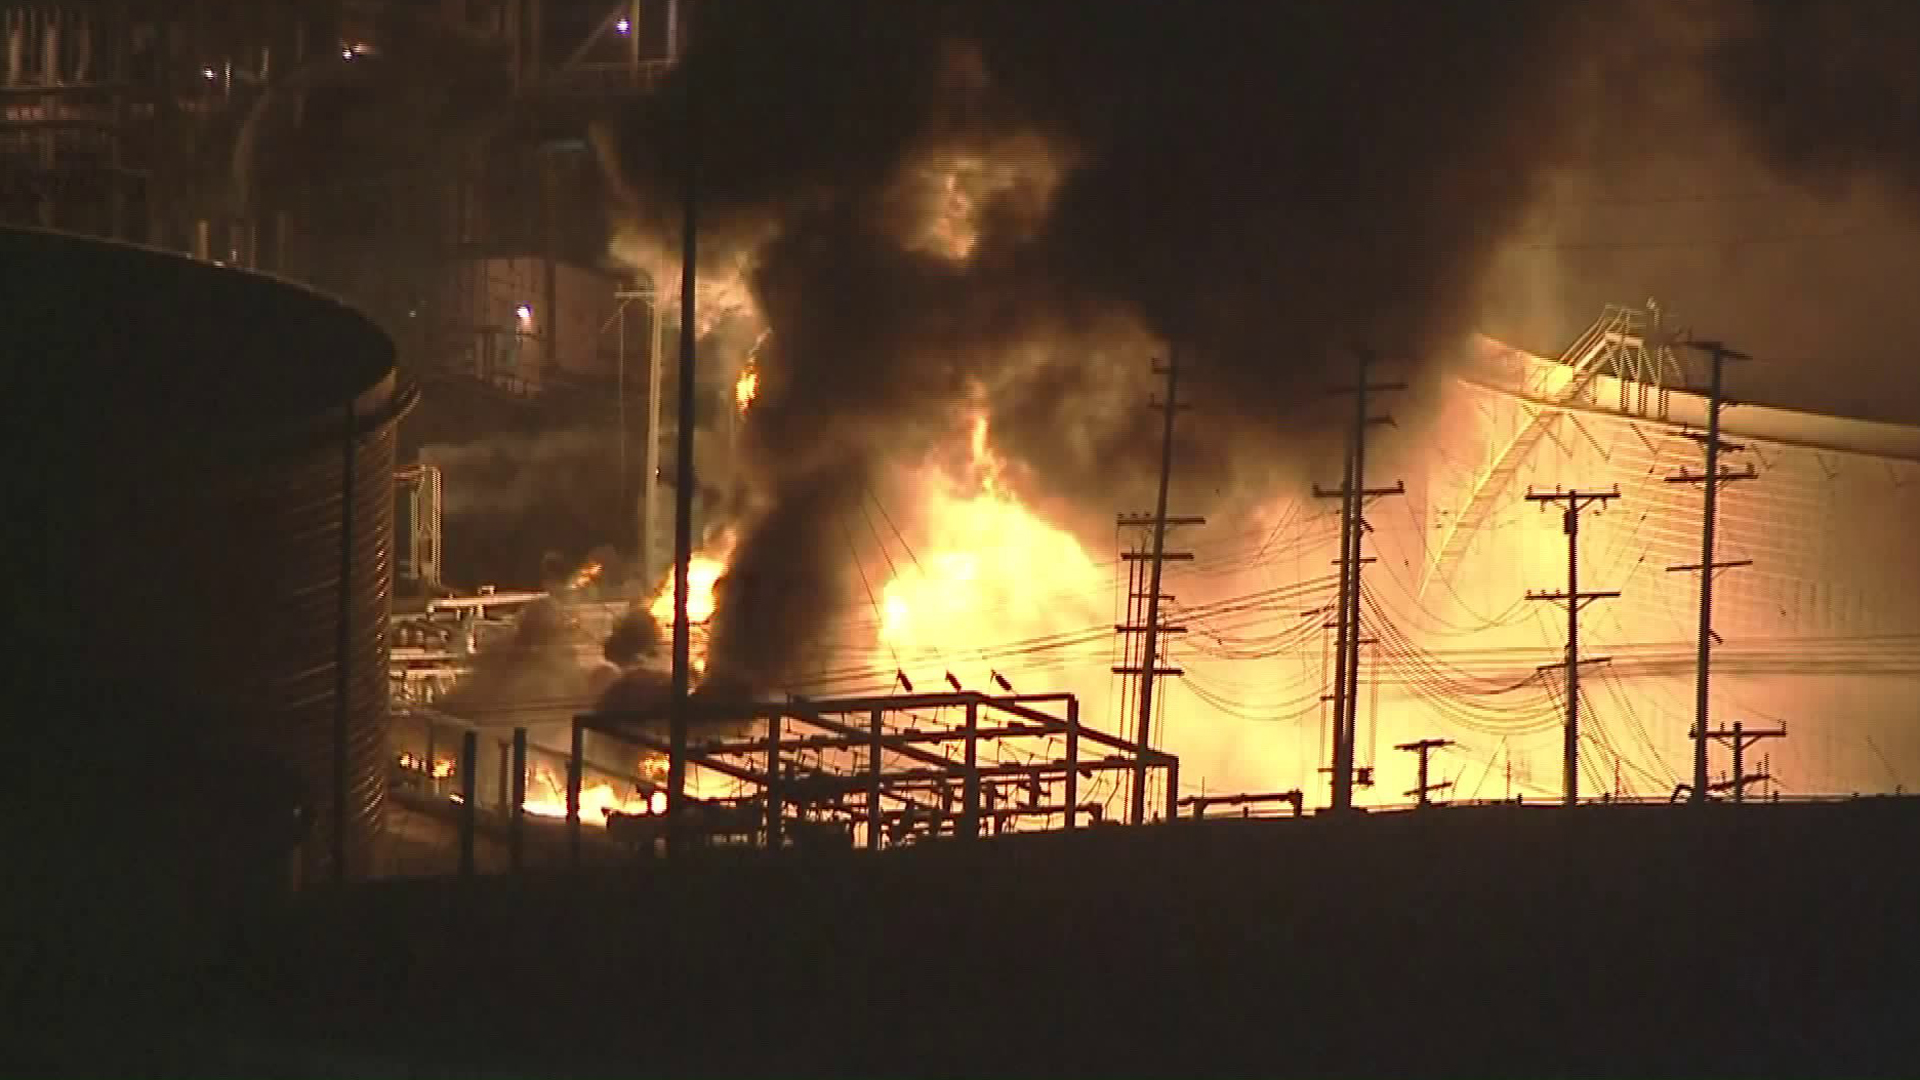 A fire was burning at the Chevron refinery in El Segundo on Oct. 17, 2017. (Credit: KTLA)